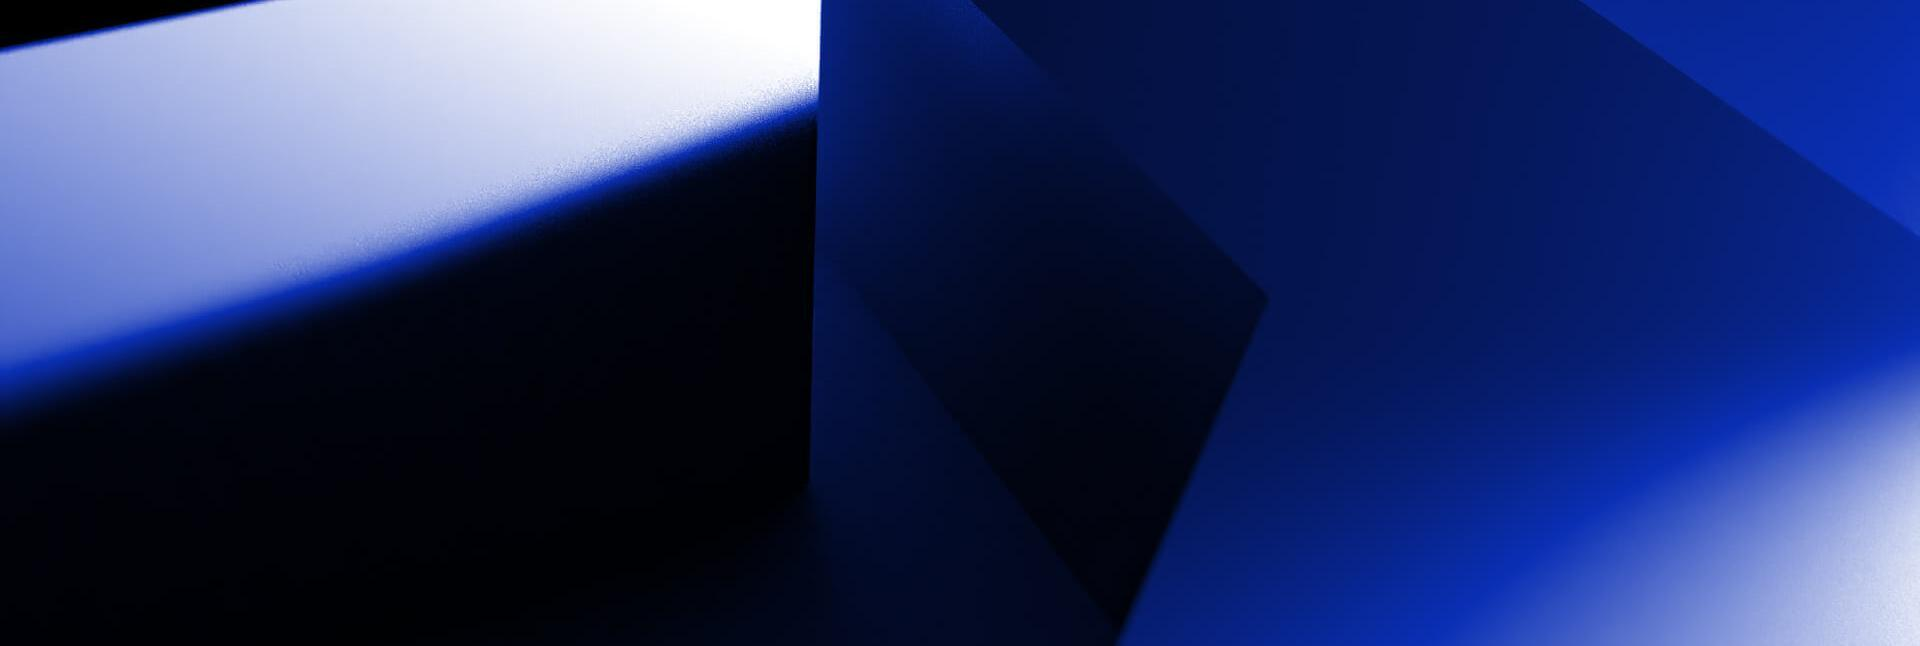 rra-background-blue-6-2021.jpg